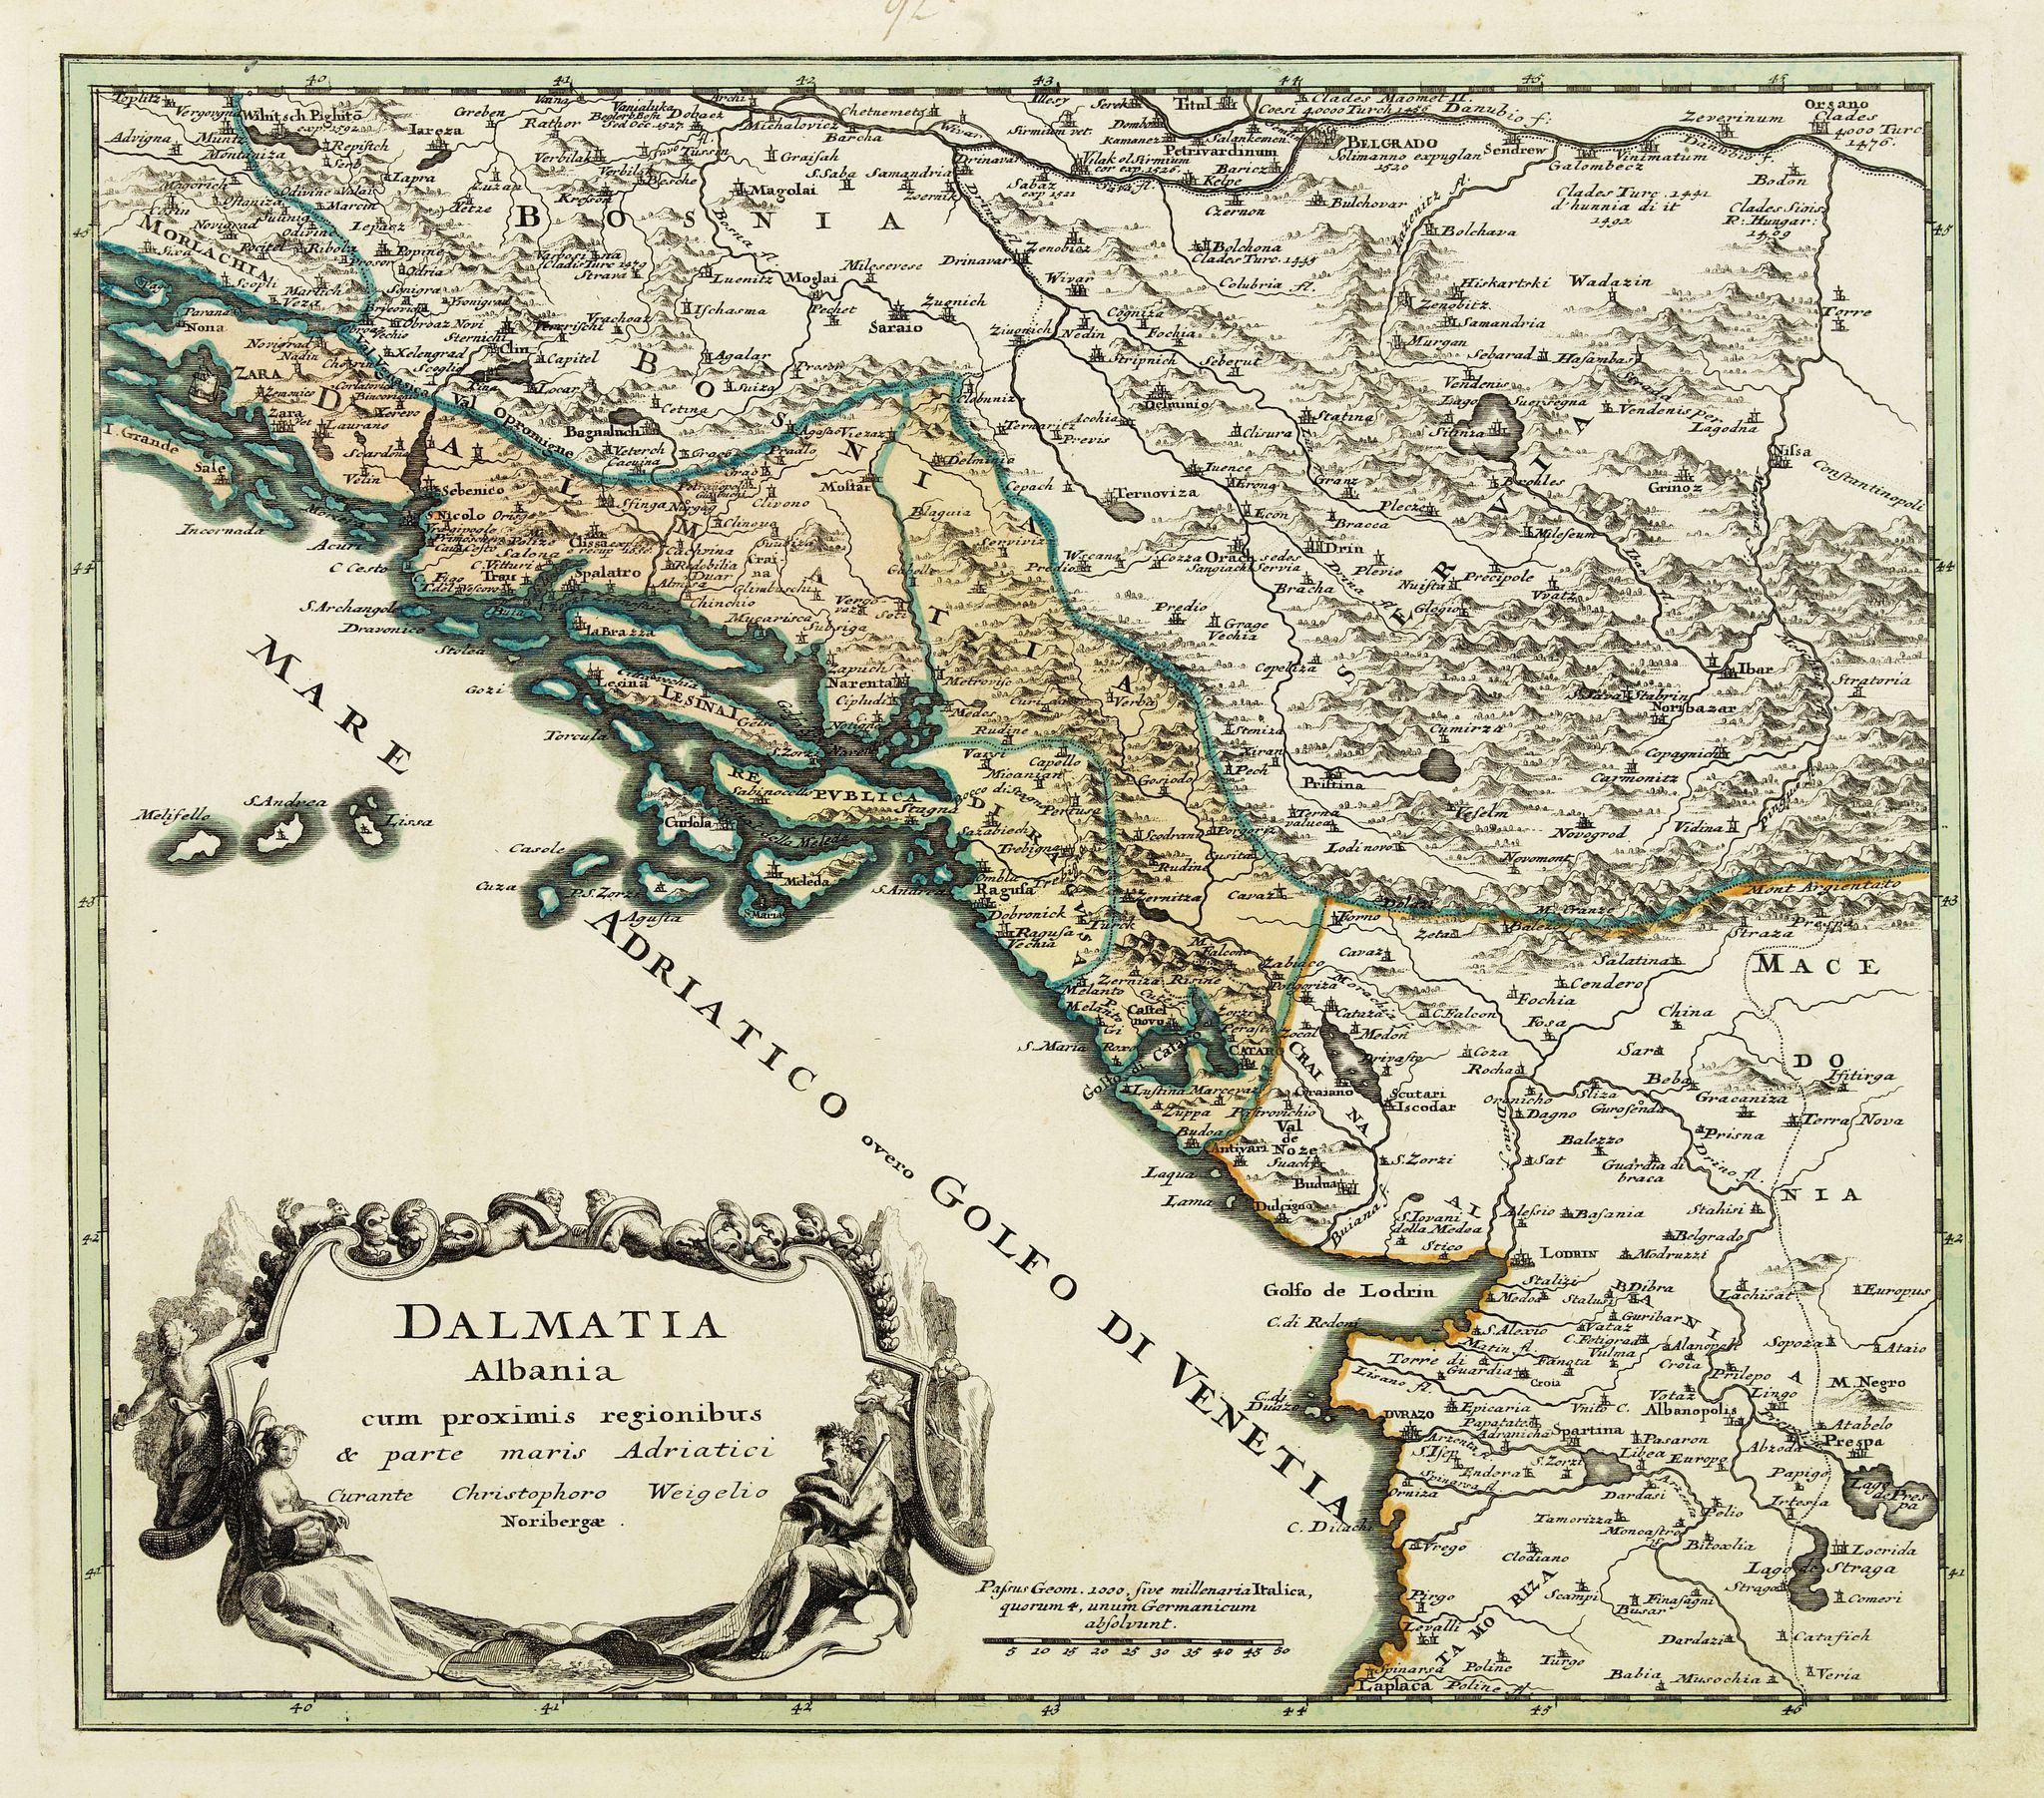 Old map by WEIGEL C  - Dalmatia Albania cum prximis